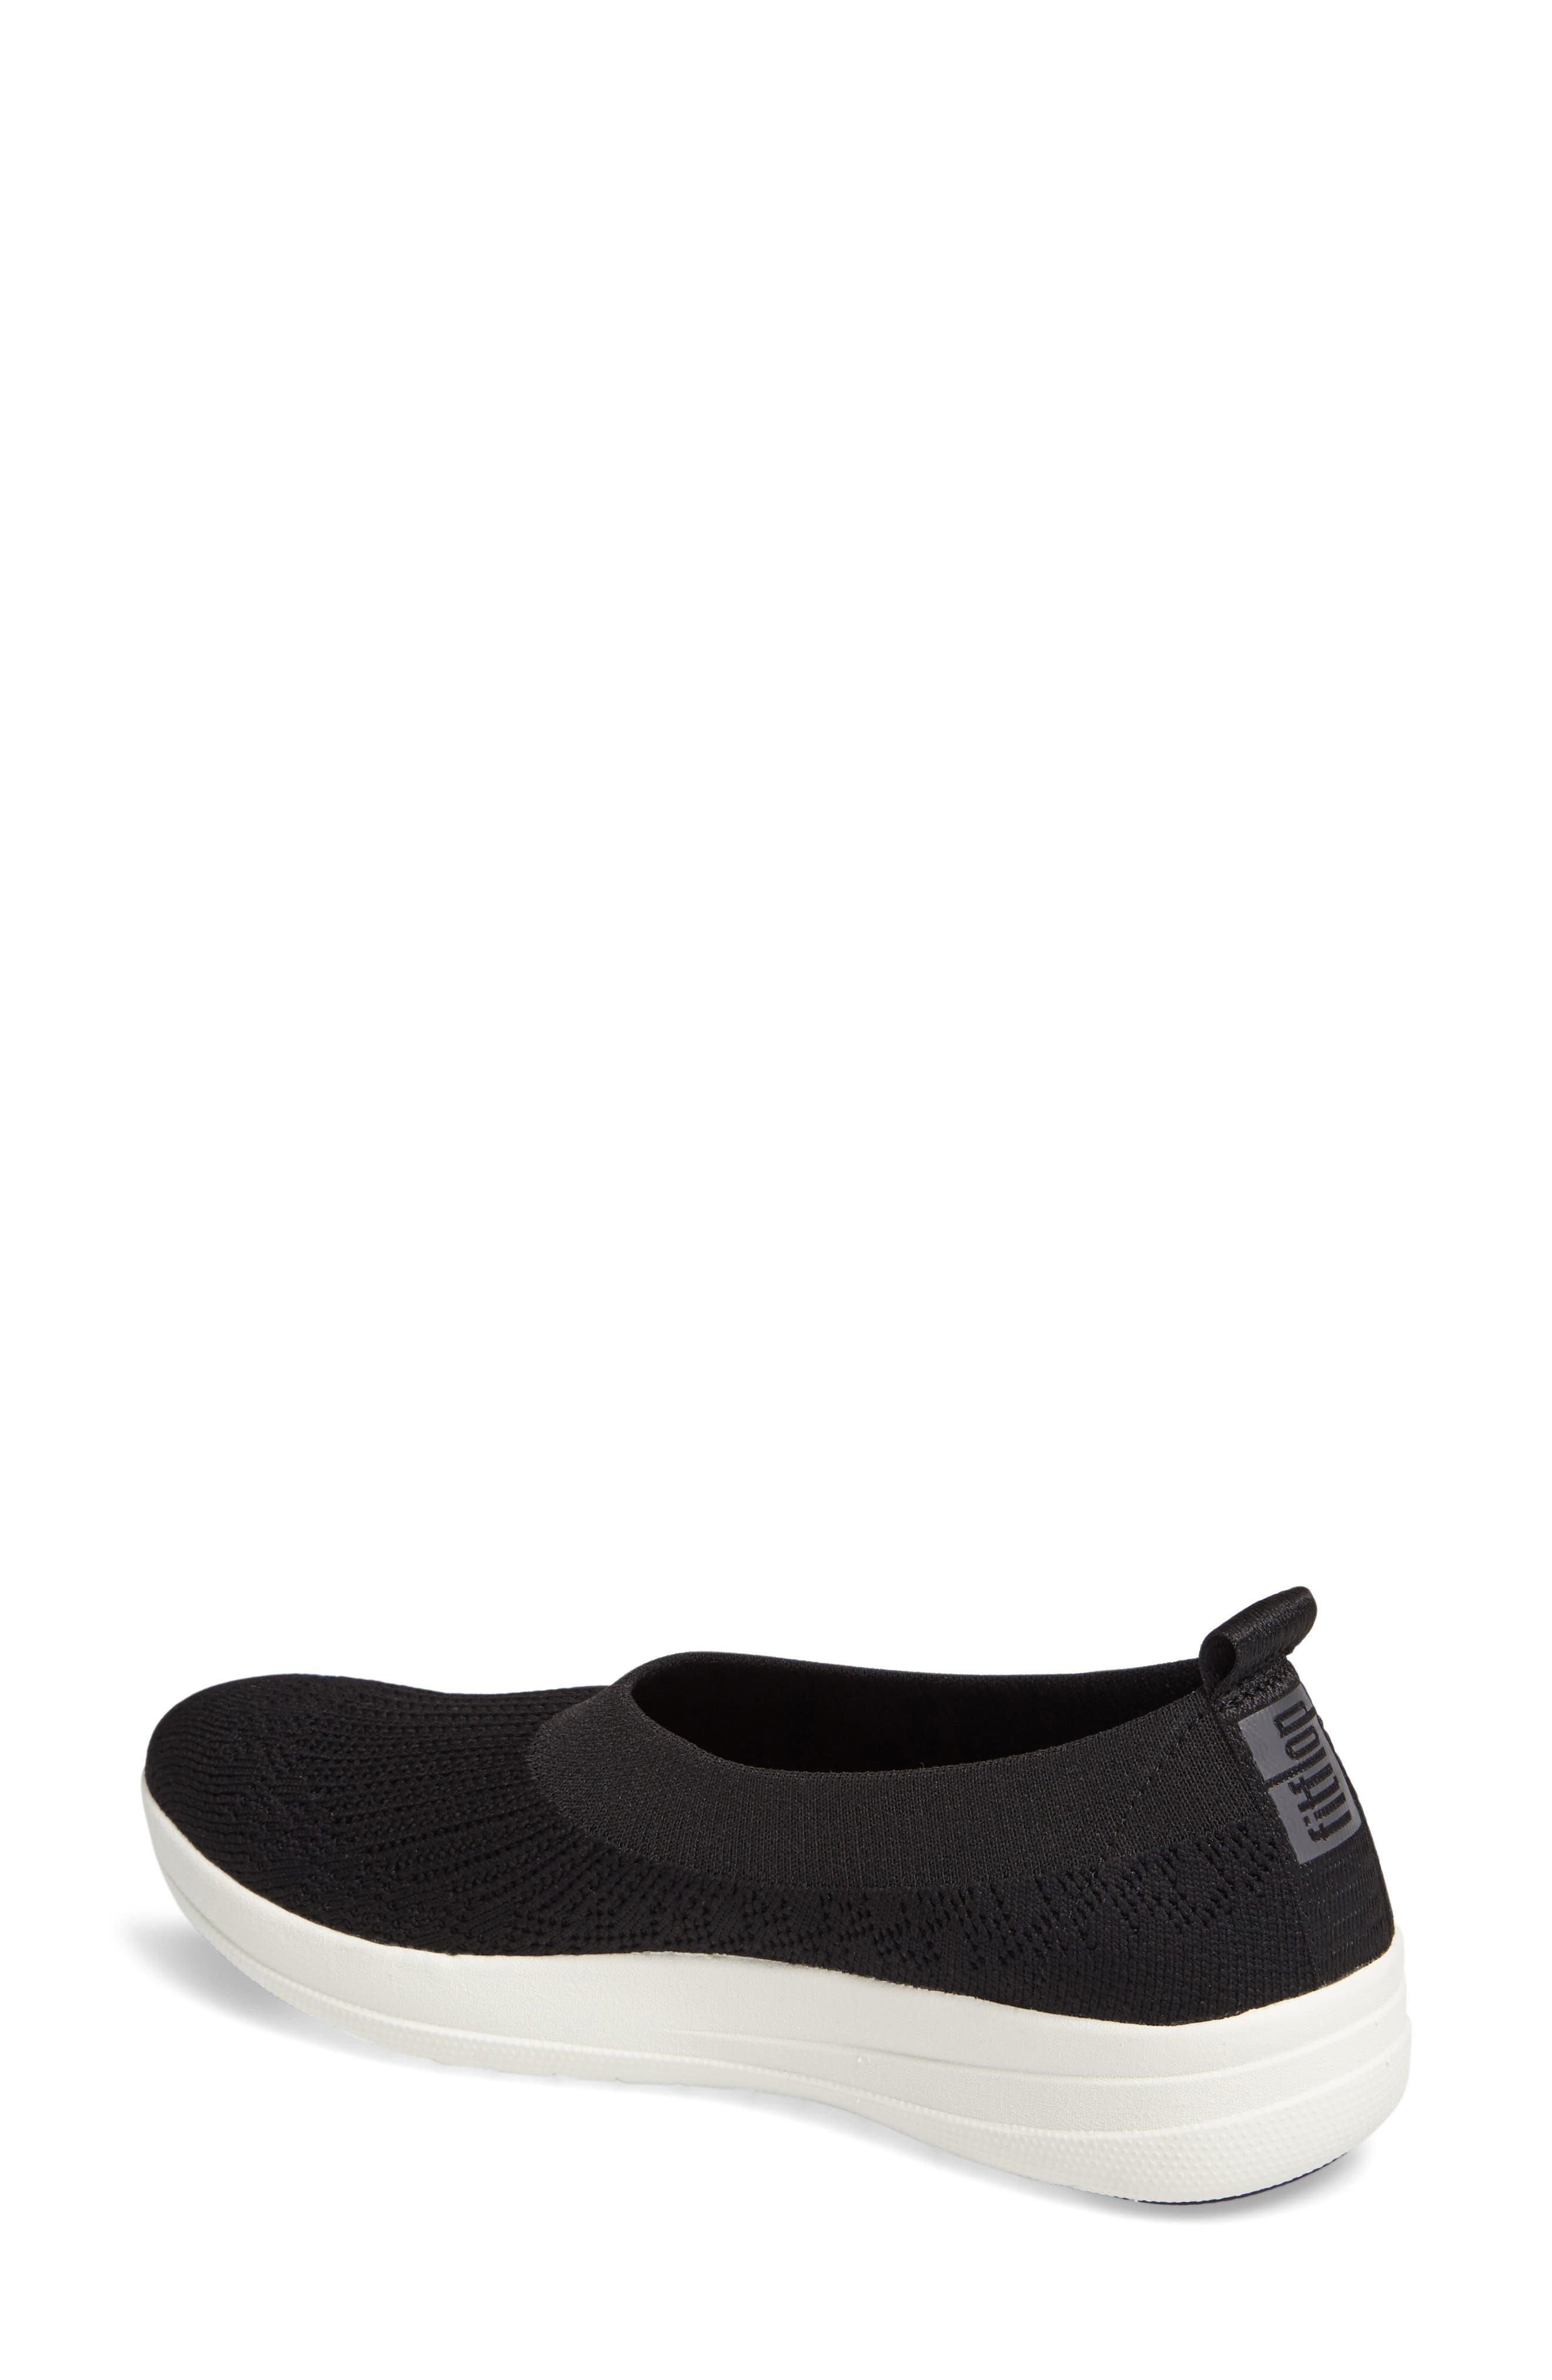 FITFLOP, Uberknit Slip-On Sneaker, Alternate thumbnail 2, color, BLACK FABRIC